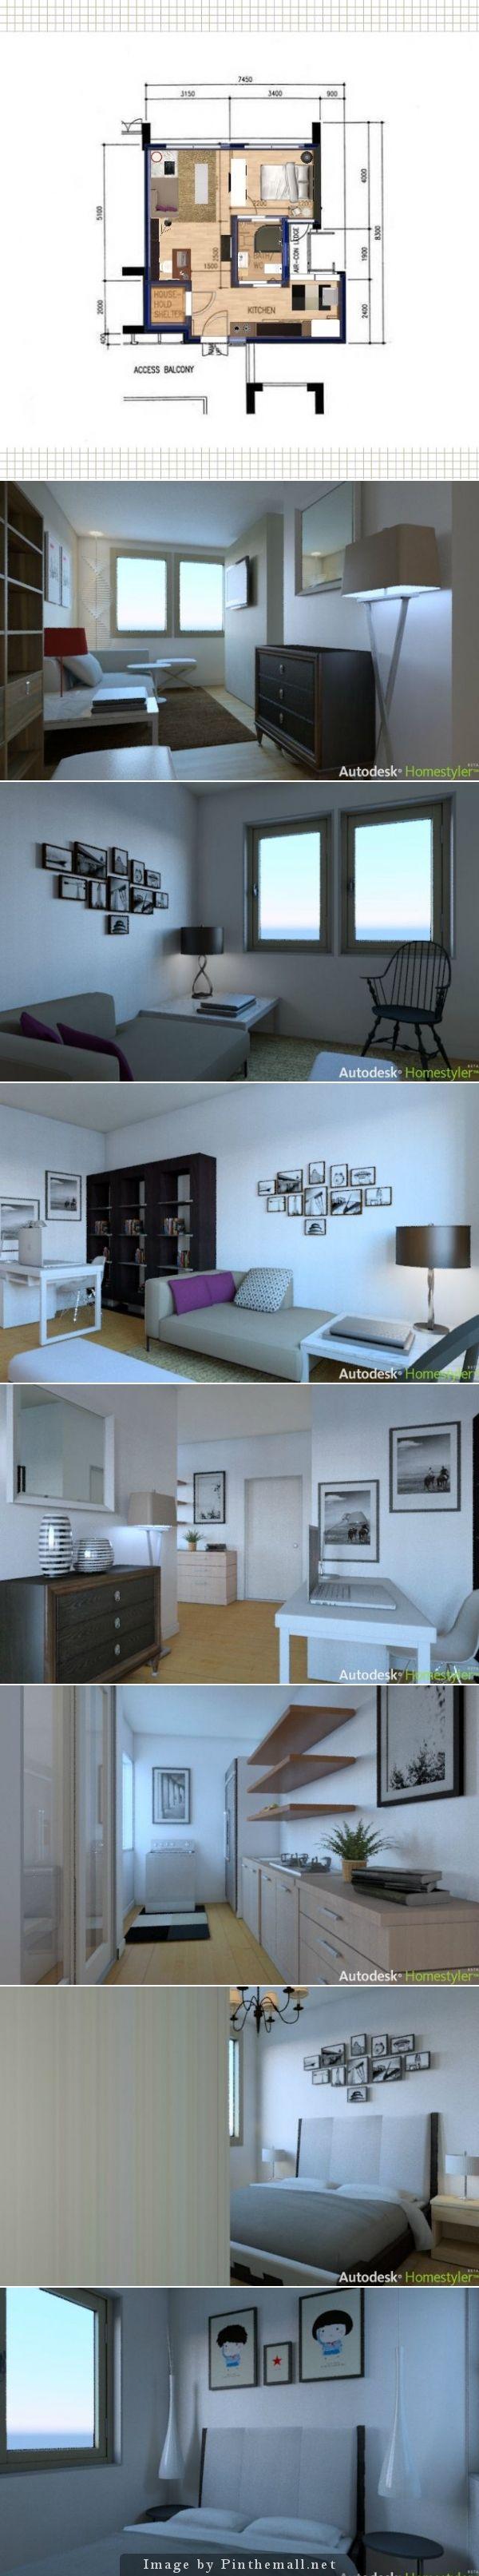 HDB 2 Room BTO At Sengkang Fernvale Lea Also Design By SSphere Online Design  Magazine